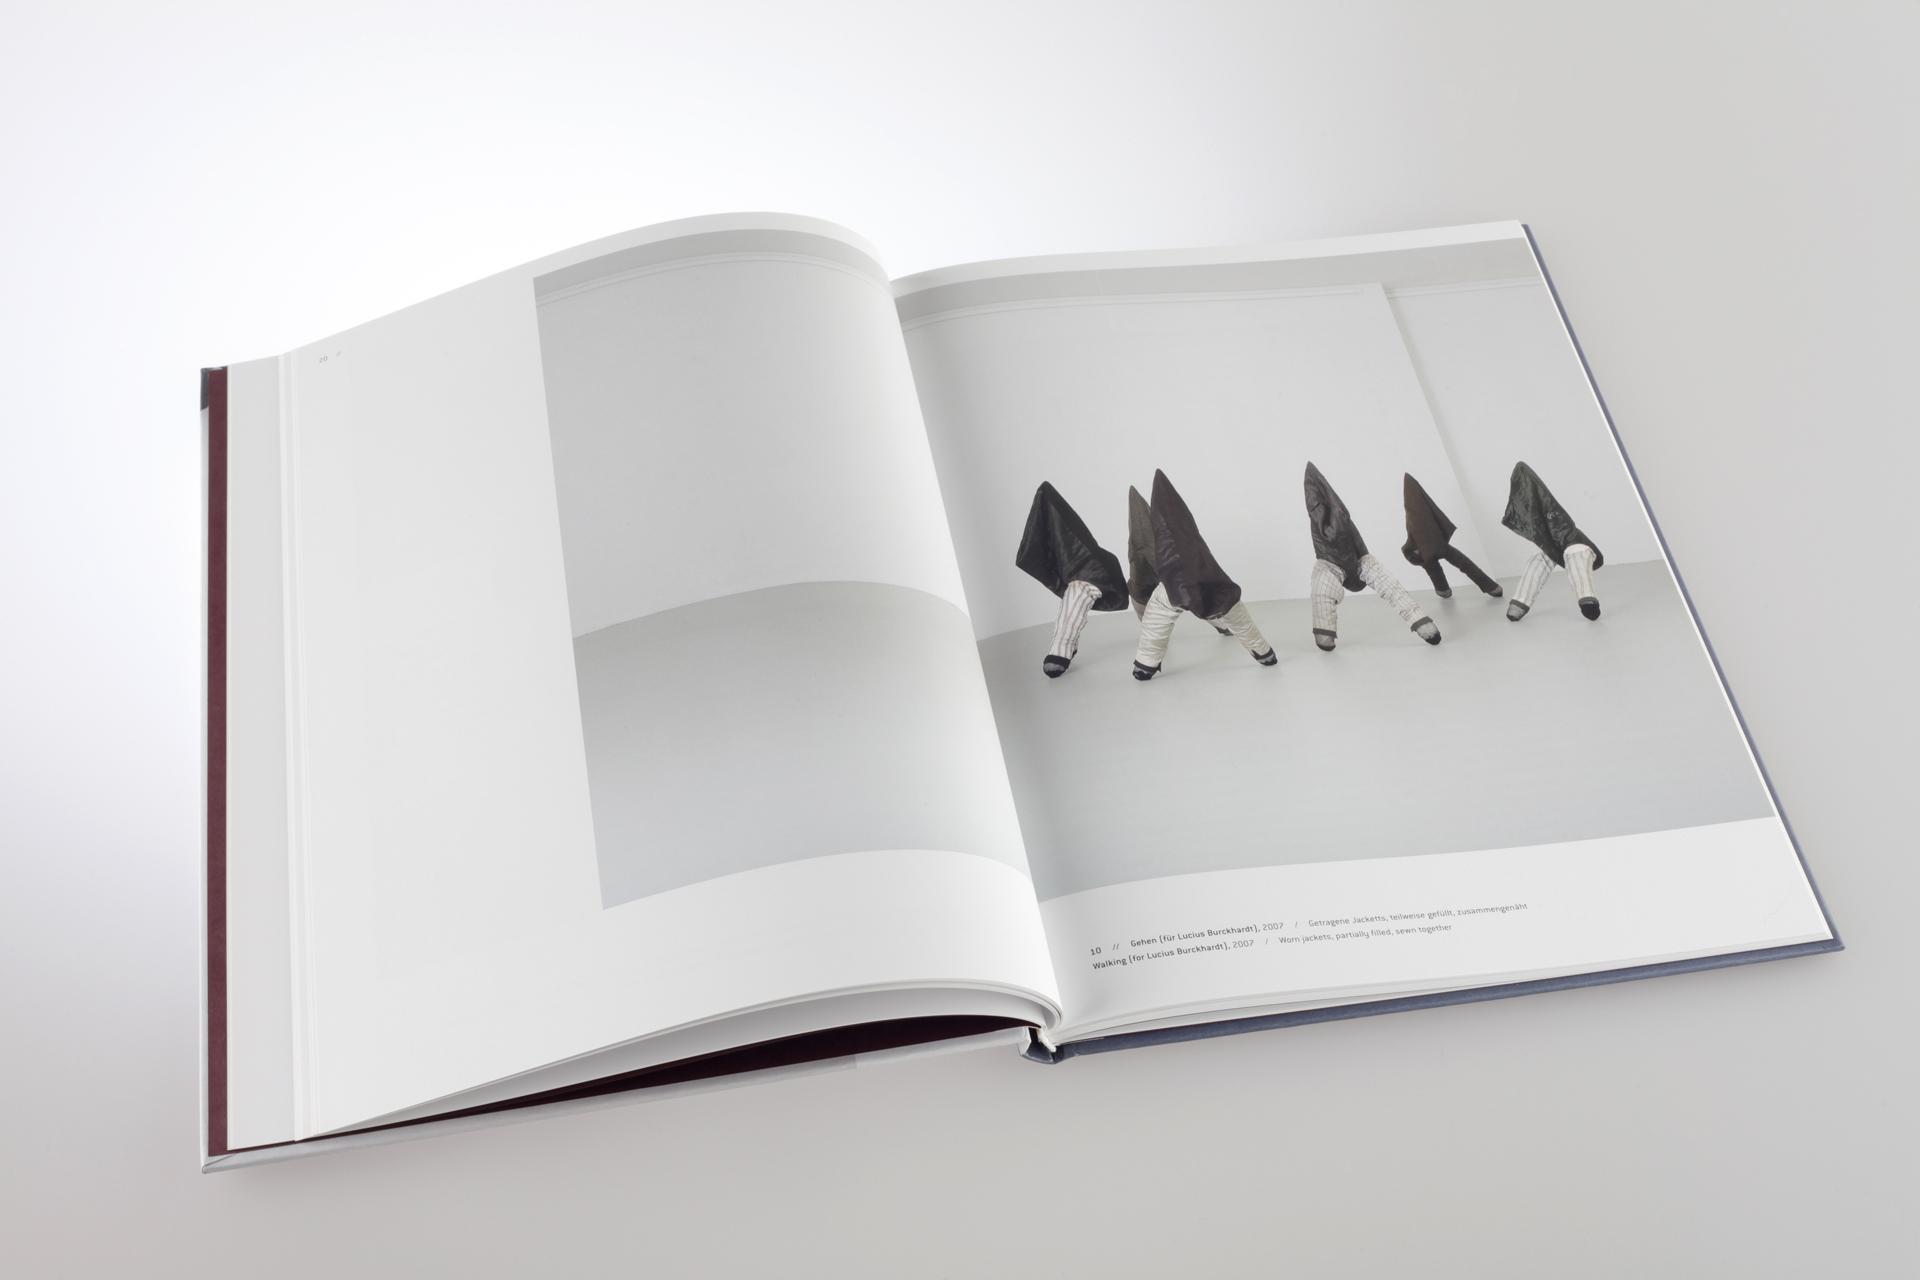 B_Engberding_2_bearb_Book